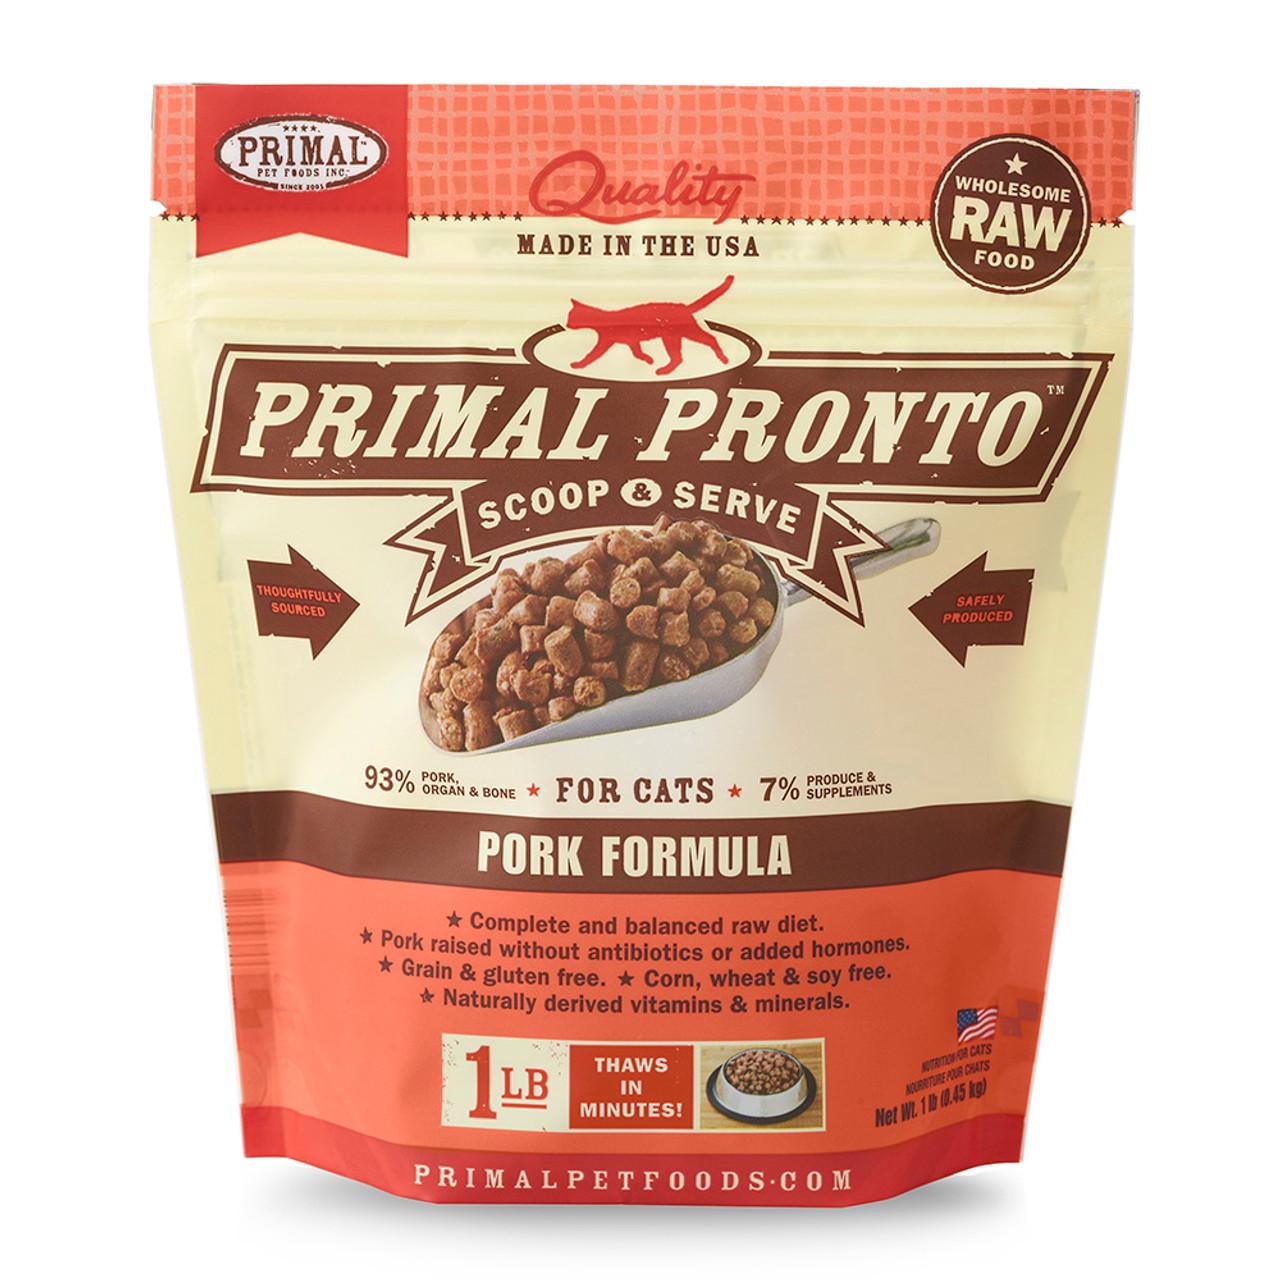 Primal Pronto Raw Frozen Feline Pork Formula Cat Food